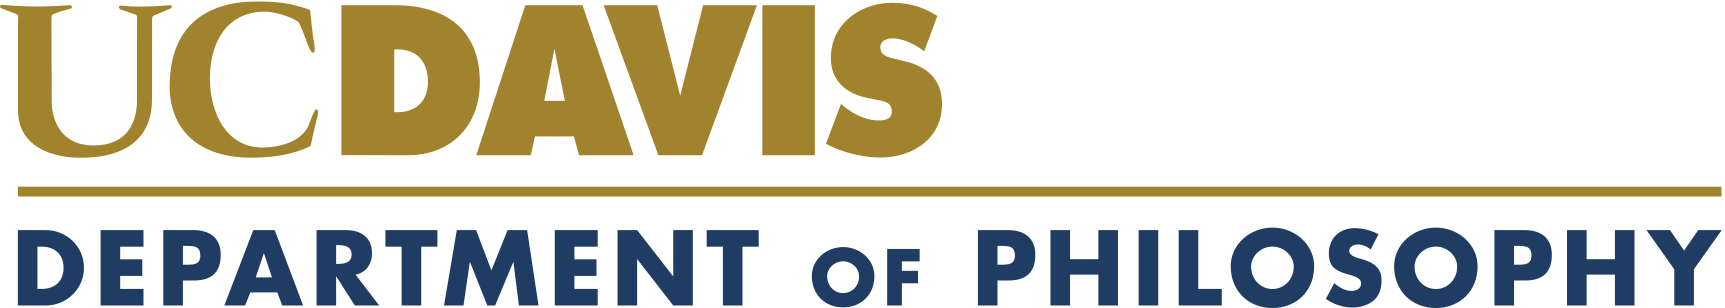 UCDavis Rectangular logo